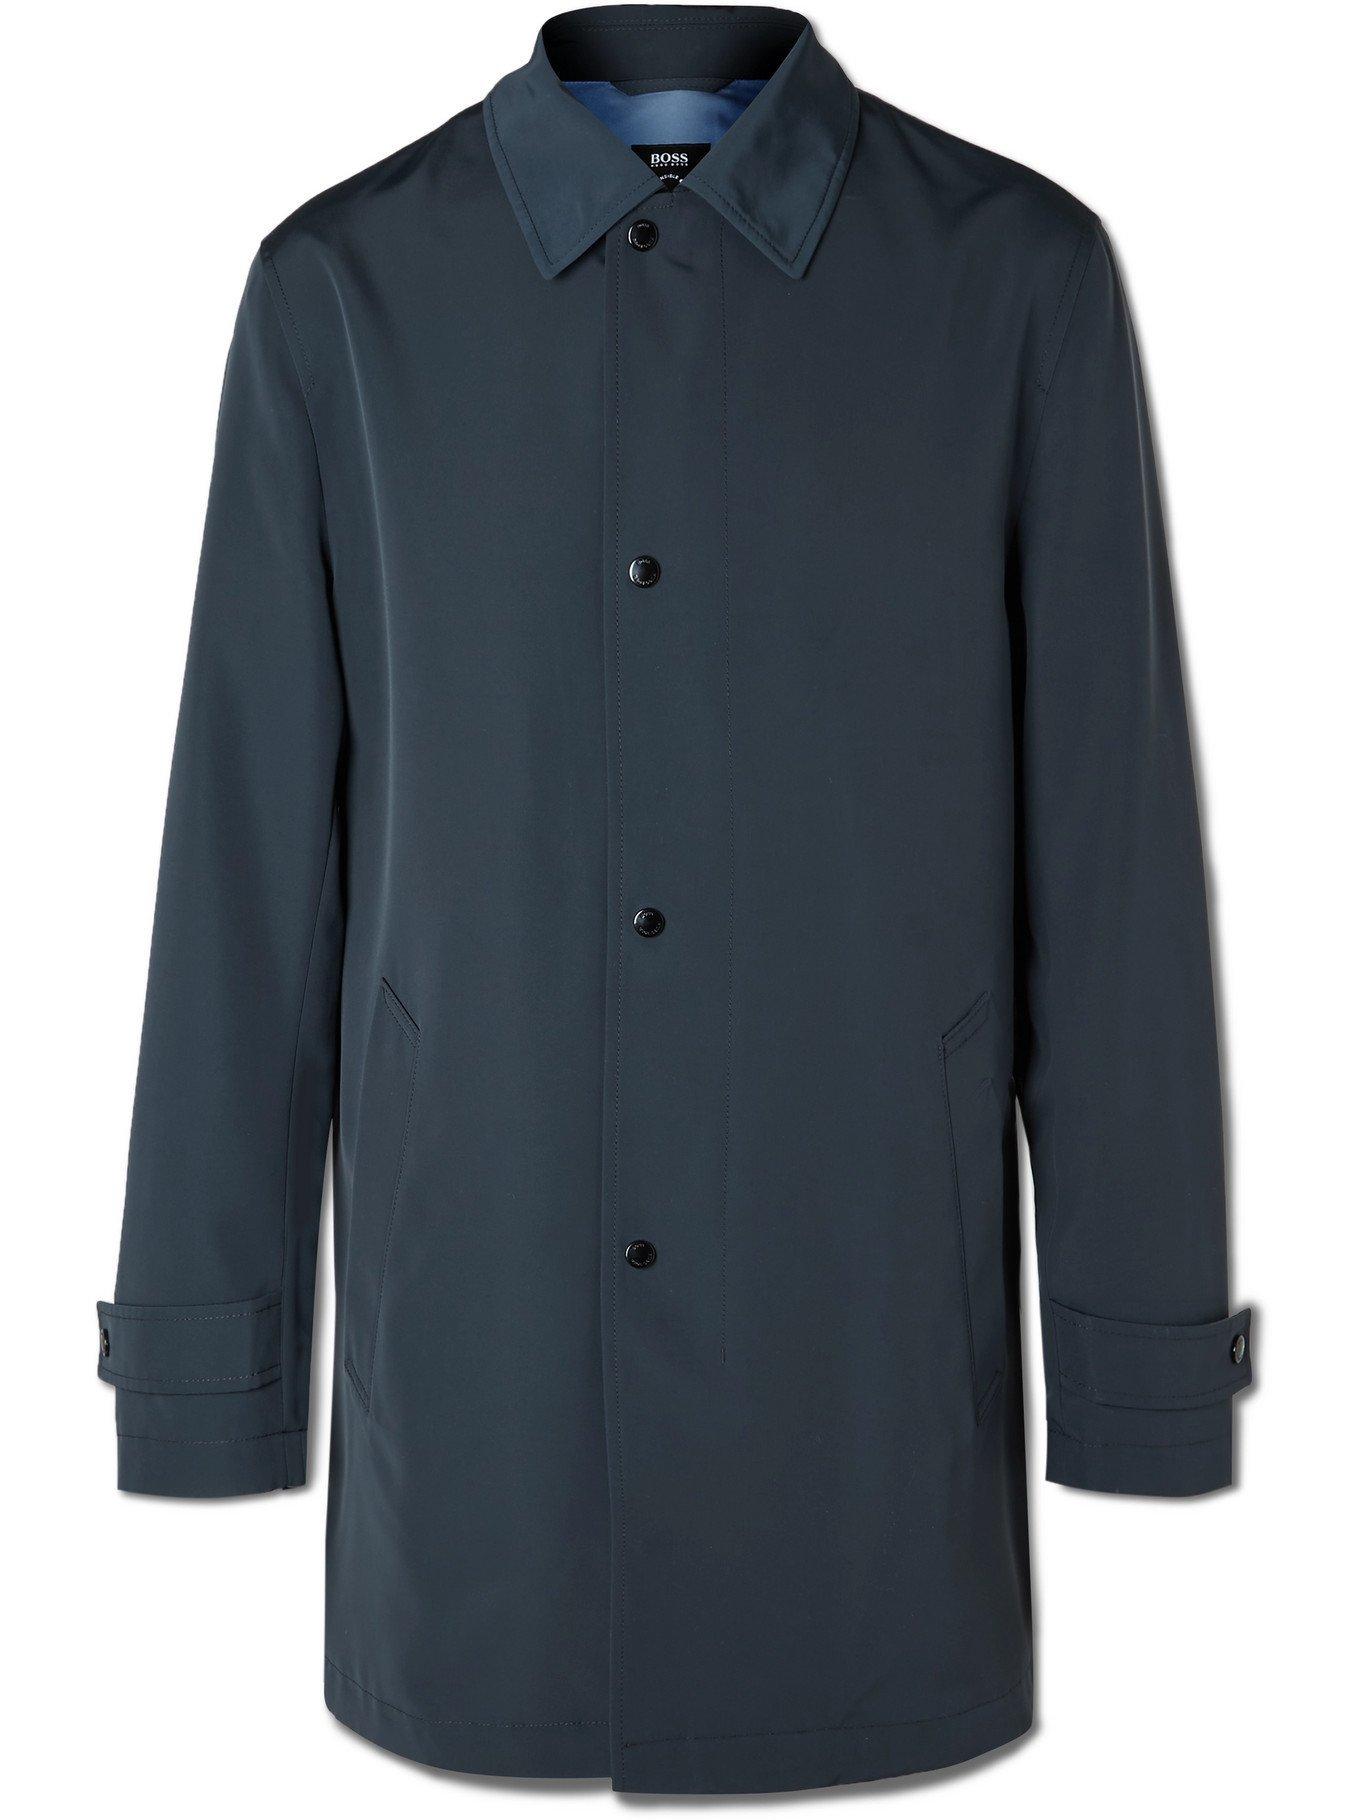 HUGO BOSS - Recycled Shell Coat - Blue - IT 44